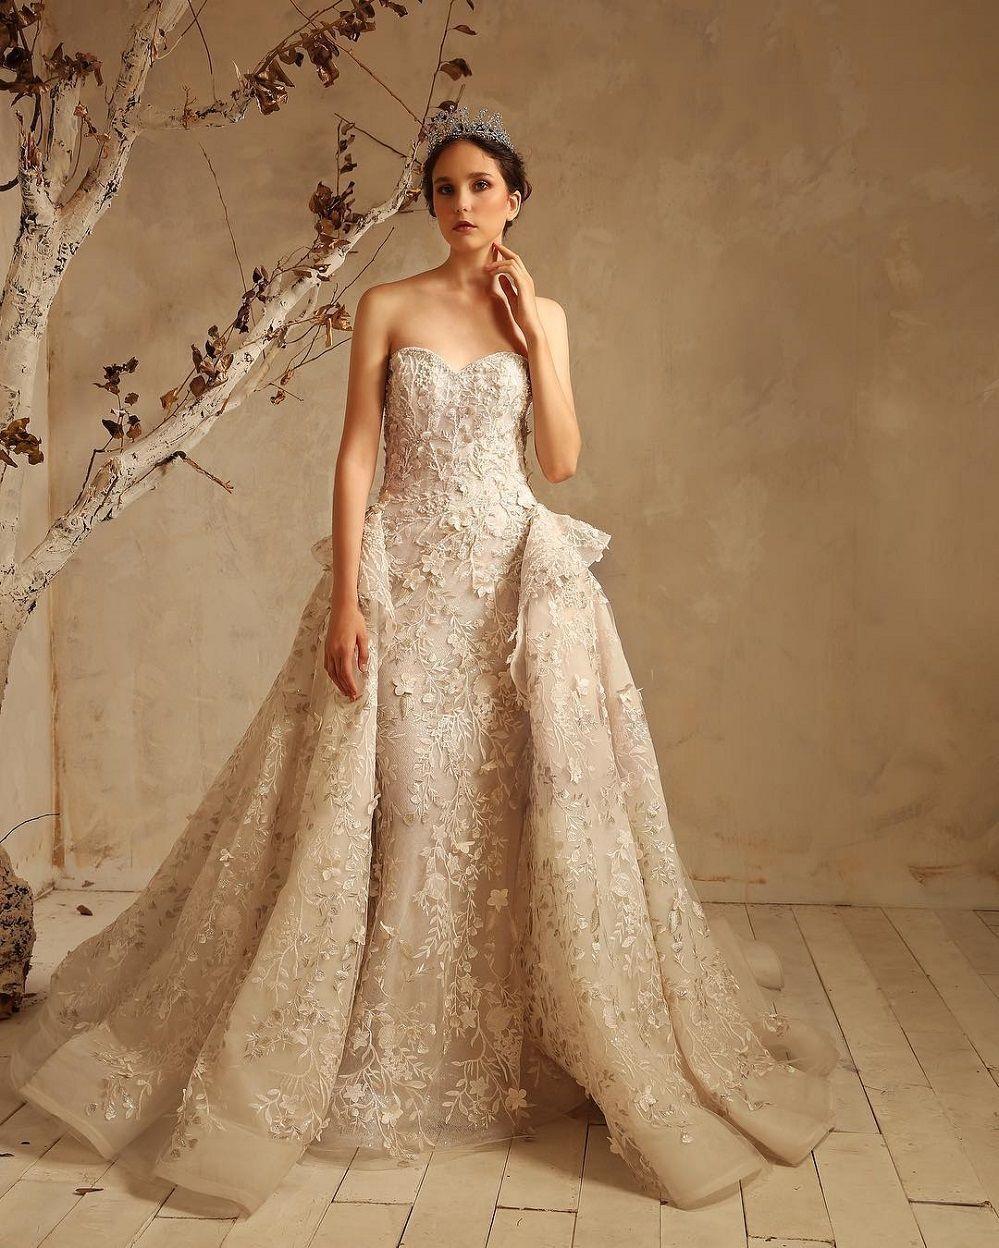 57 Stunning Wedding Dresses With Detachable Skirts Ball Gowns Wedding Ball Gown Wedding Dress Gowns